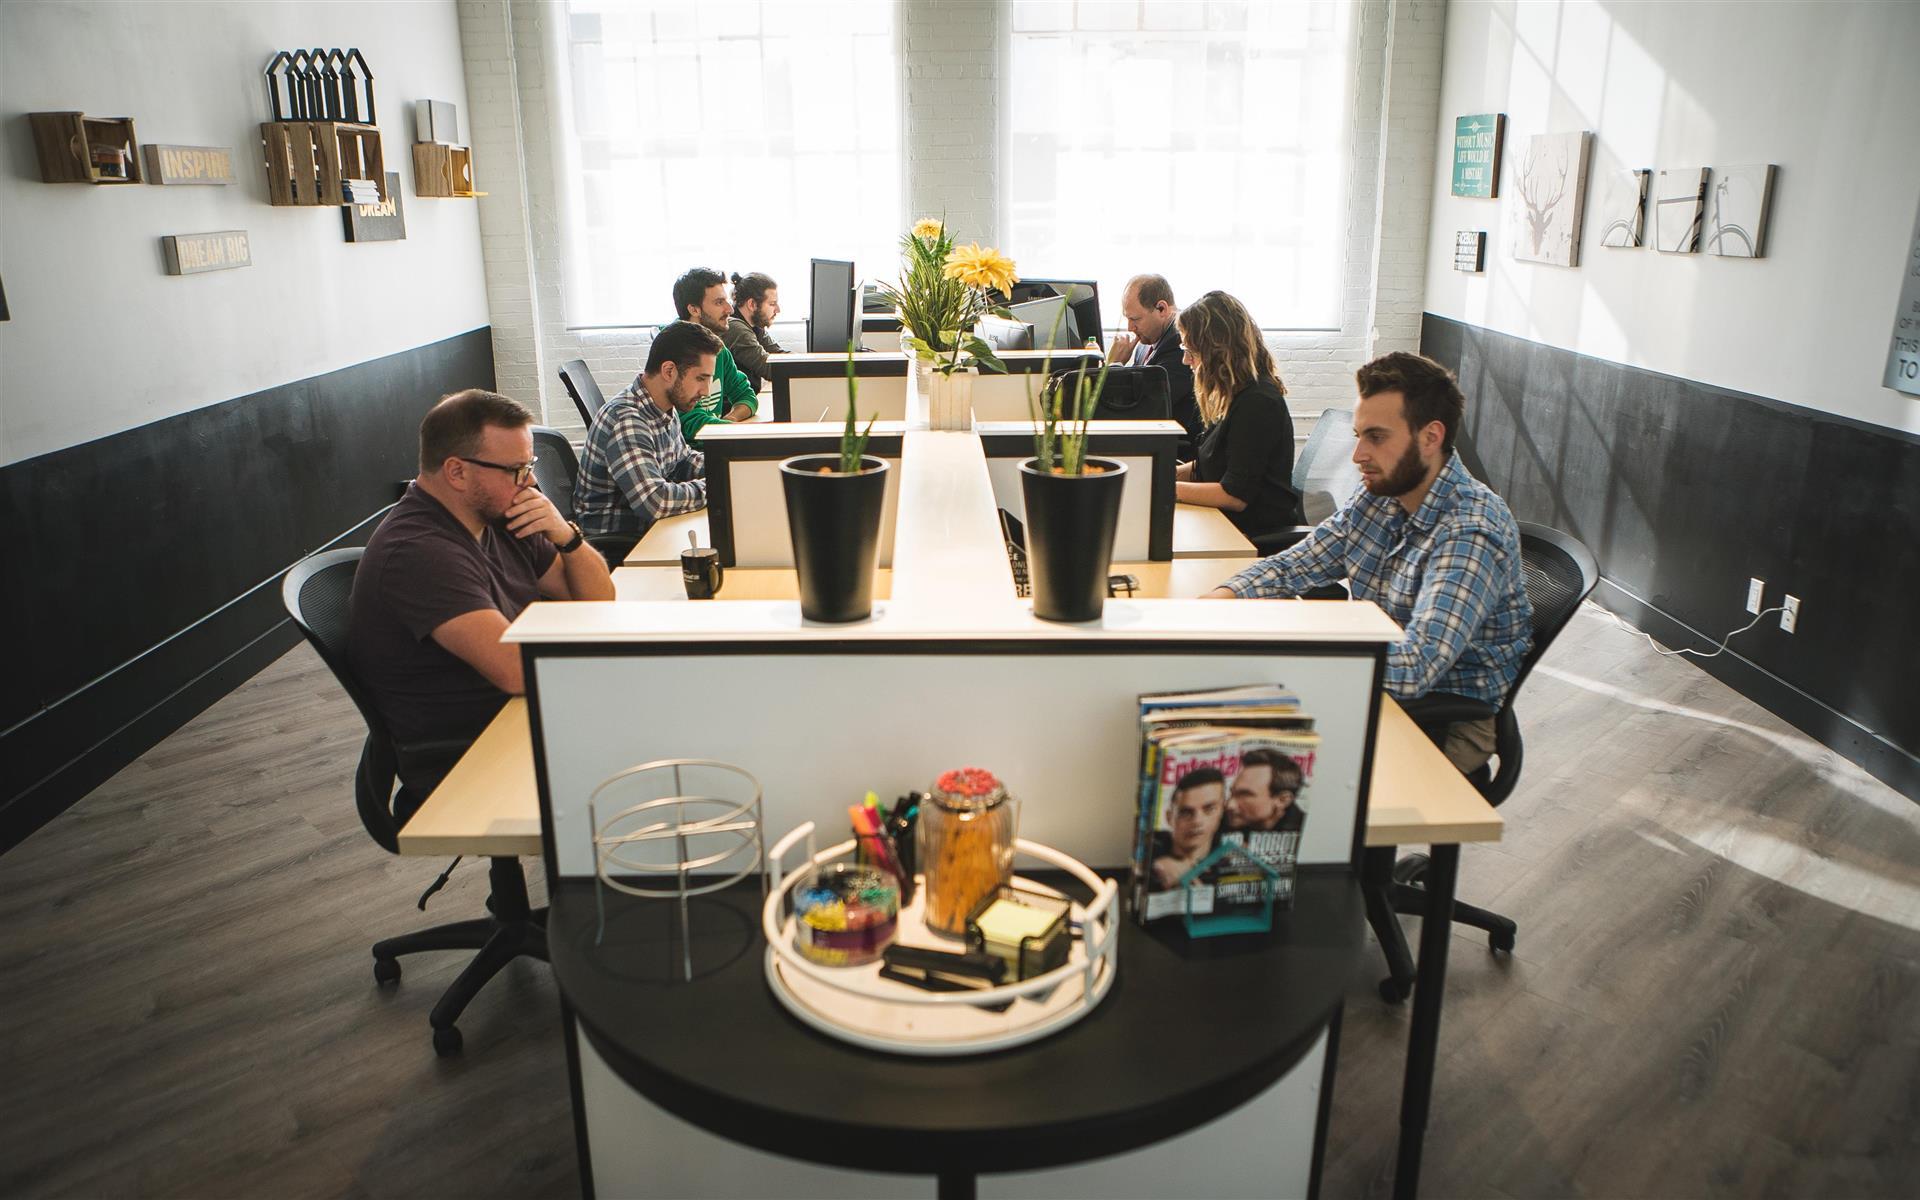 District 28 WorkSpace - Dedicated Desk (WorkSpace 2)